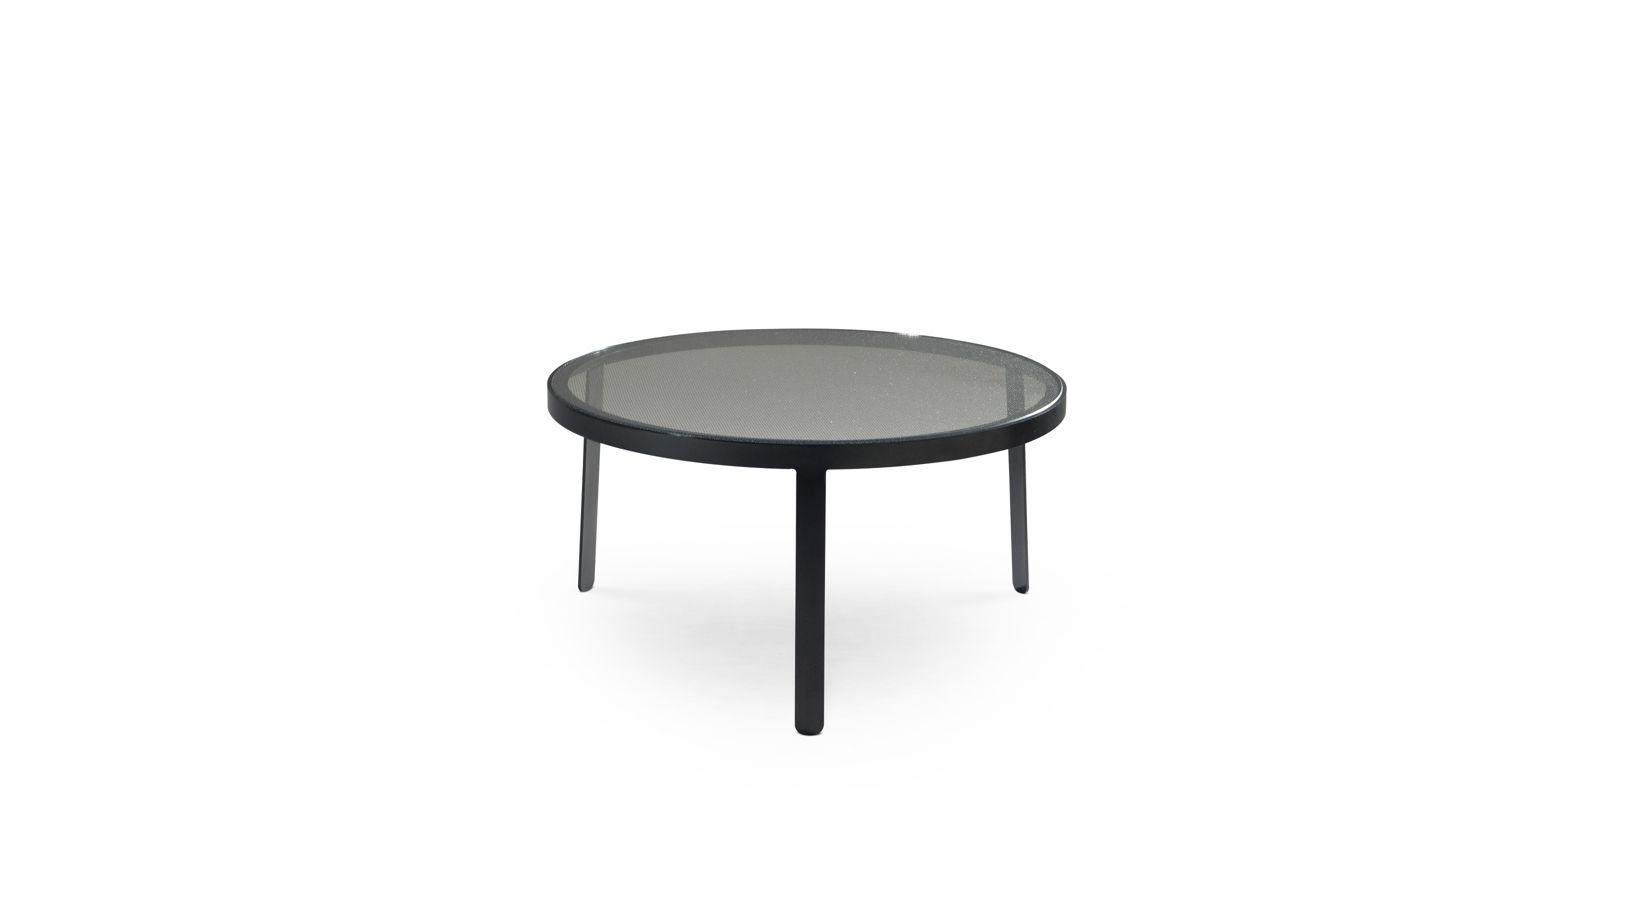 Biz pedestal table roche bobois for Canape roche bobois kenzo